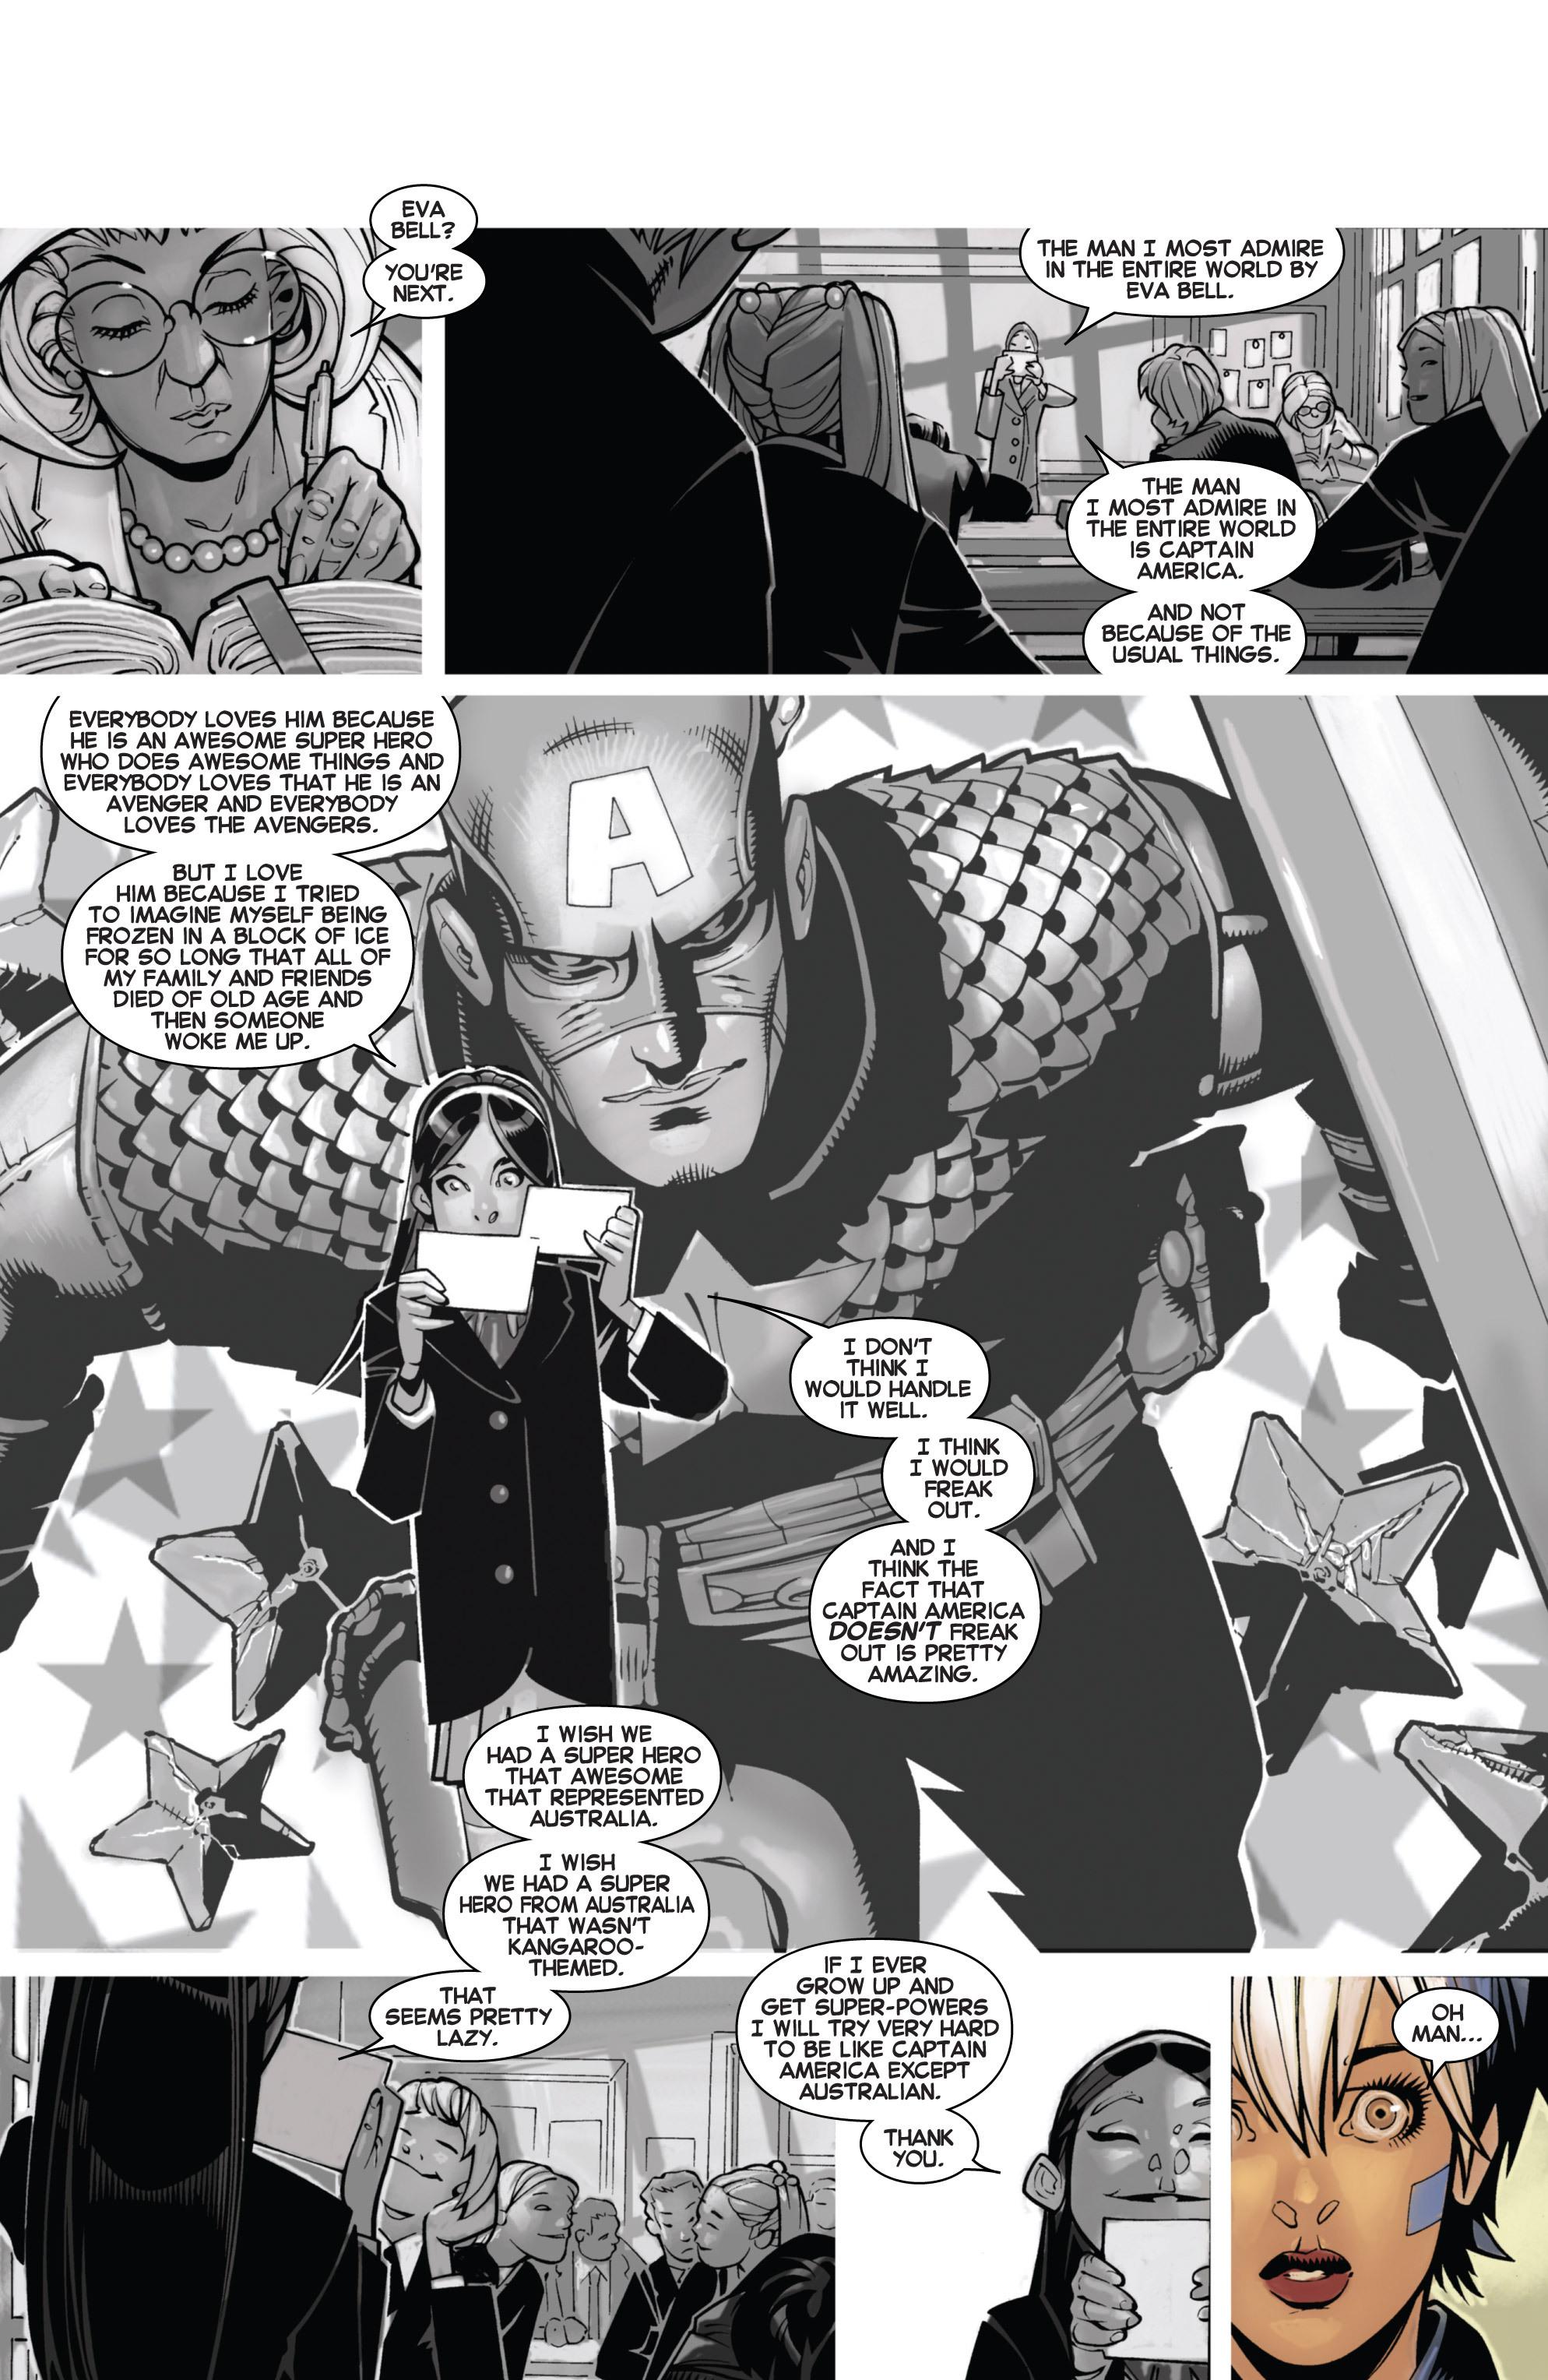 Read online Uncanny X-Men (2013) comic -  Issue # _TPB 1 - Revolution - 46